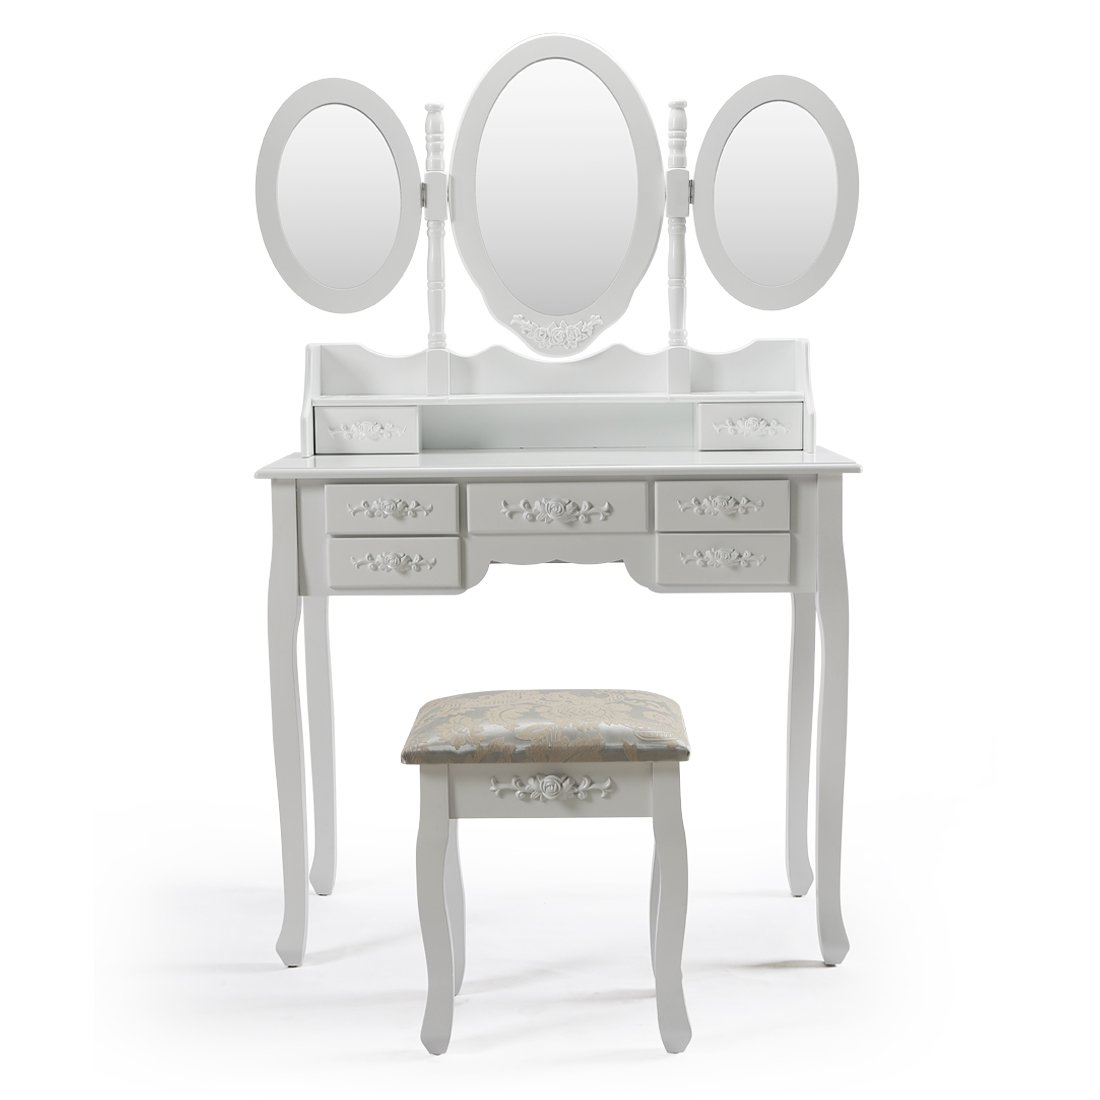 AHHC Coiffeuse Table Blanche de Maquillage avec Miroir Tiroir et Tabouret -3 miroirs-7 tiroirs